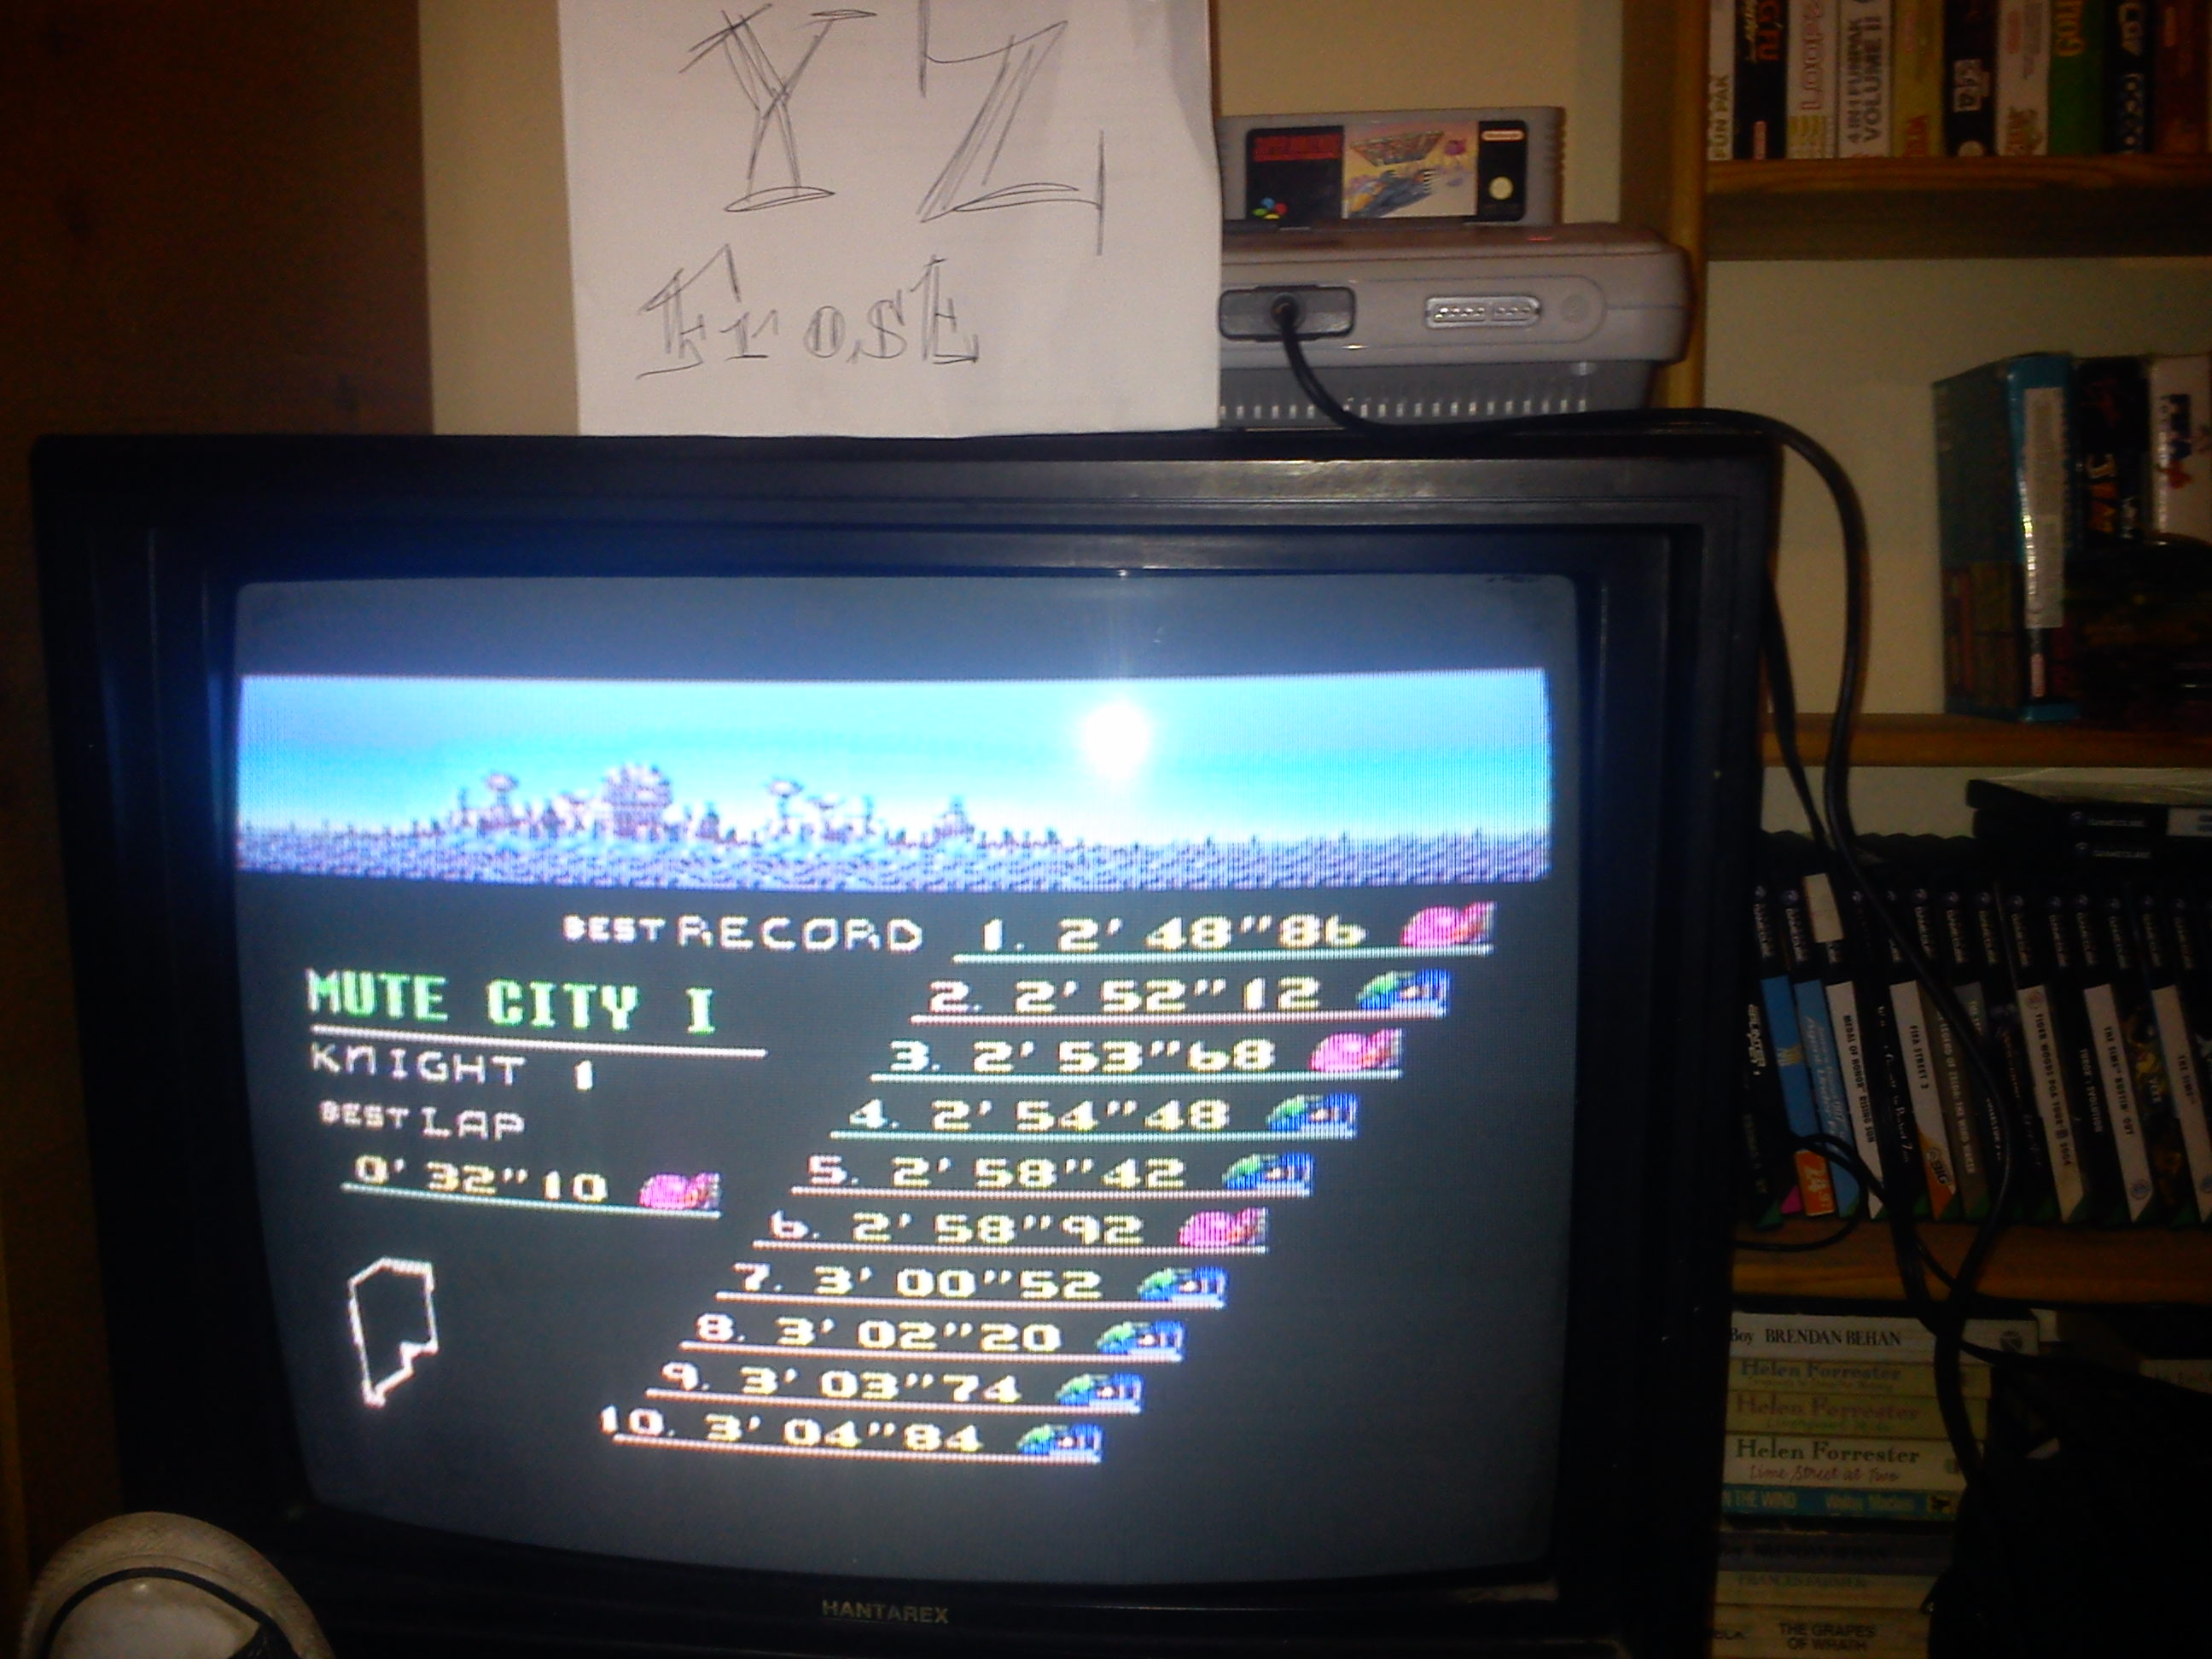 Fr0st: F-Zero: Mute City I [Beginner] (SNES/Super Famicom) 0:02:48.86 points on 2014-11-03 16:53:36